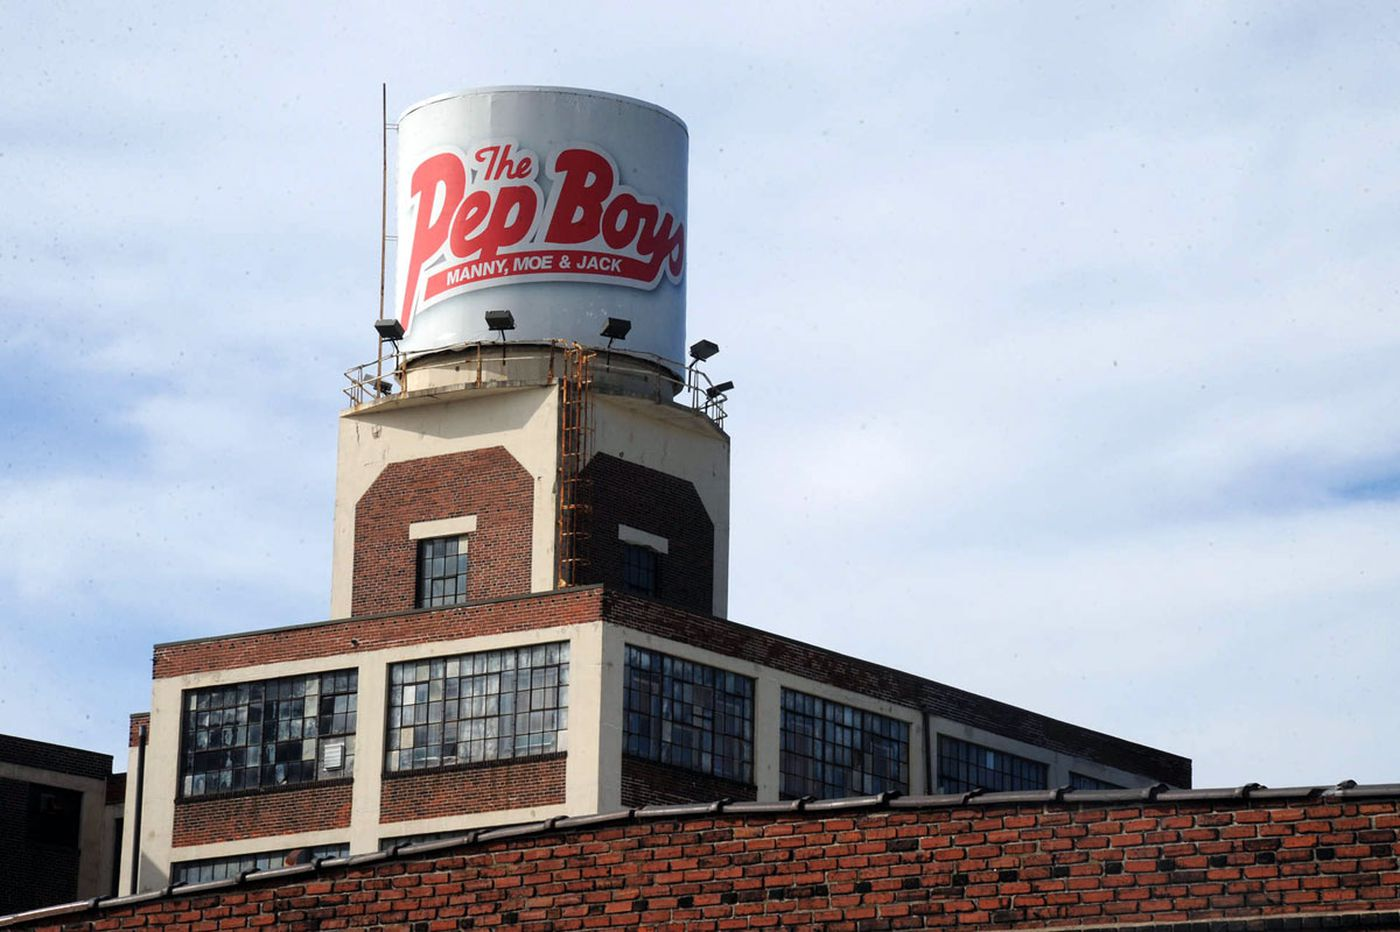 Bridgestone could raise its bid for Pep Boys